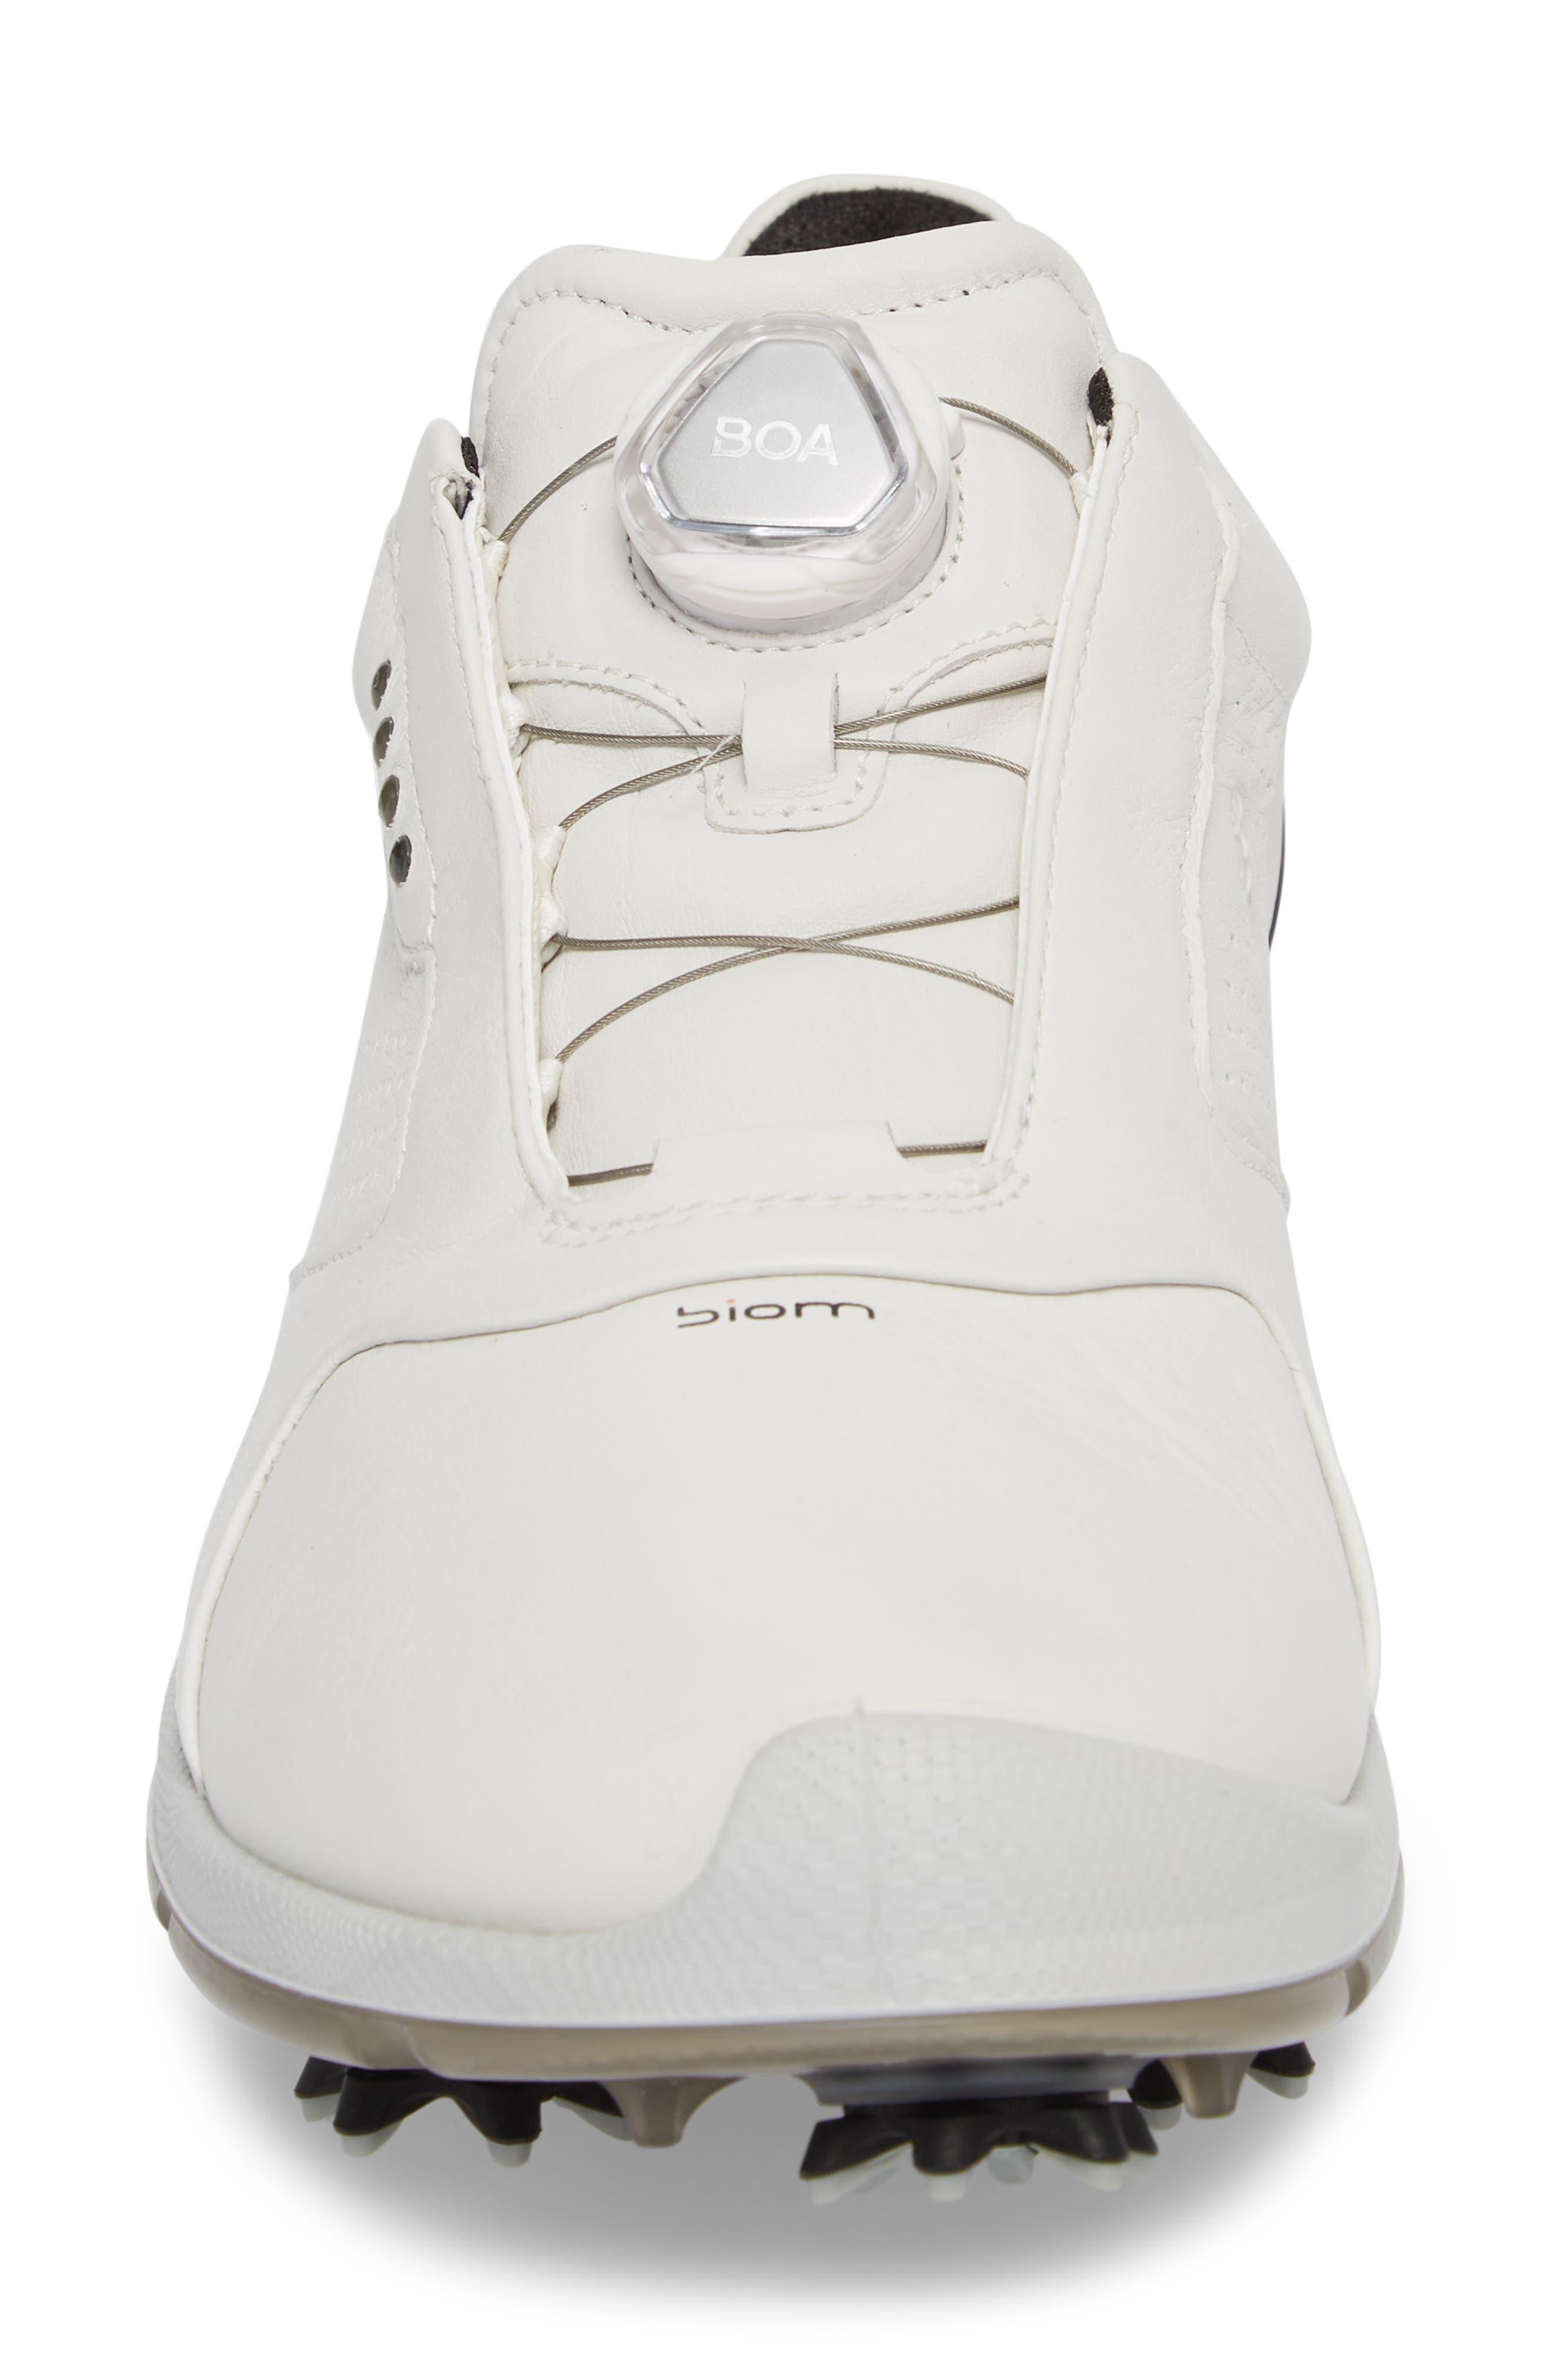 BIOM 2 BOA Gore-Tex<sup>®</sup> Golf Shoe,                             Alternate thumbnail 4, color,                             WHITE/ BLACK LEATHER